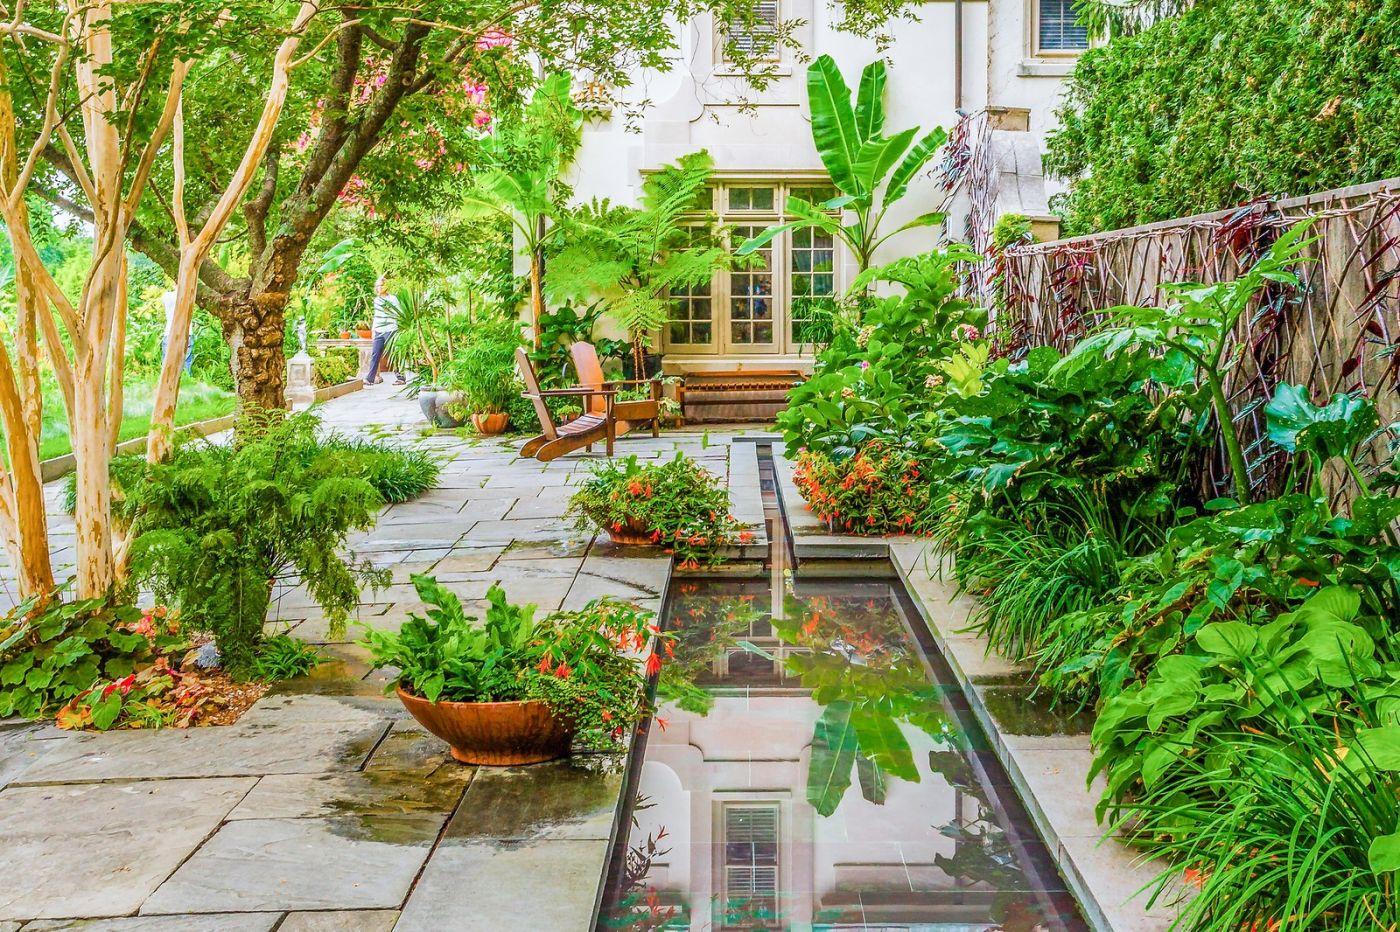 Chanticleer花园,一步一景_图1-8